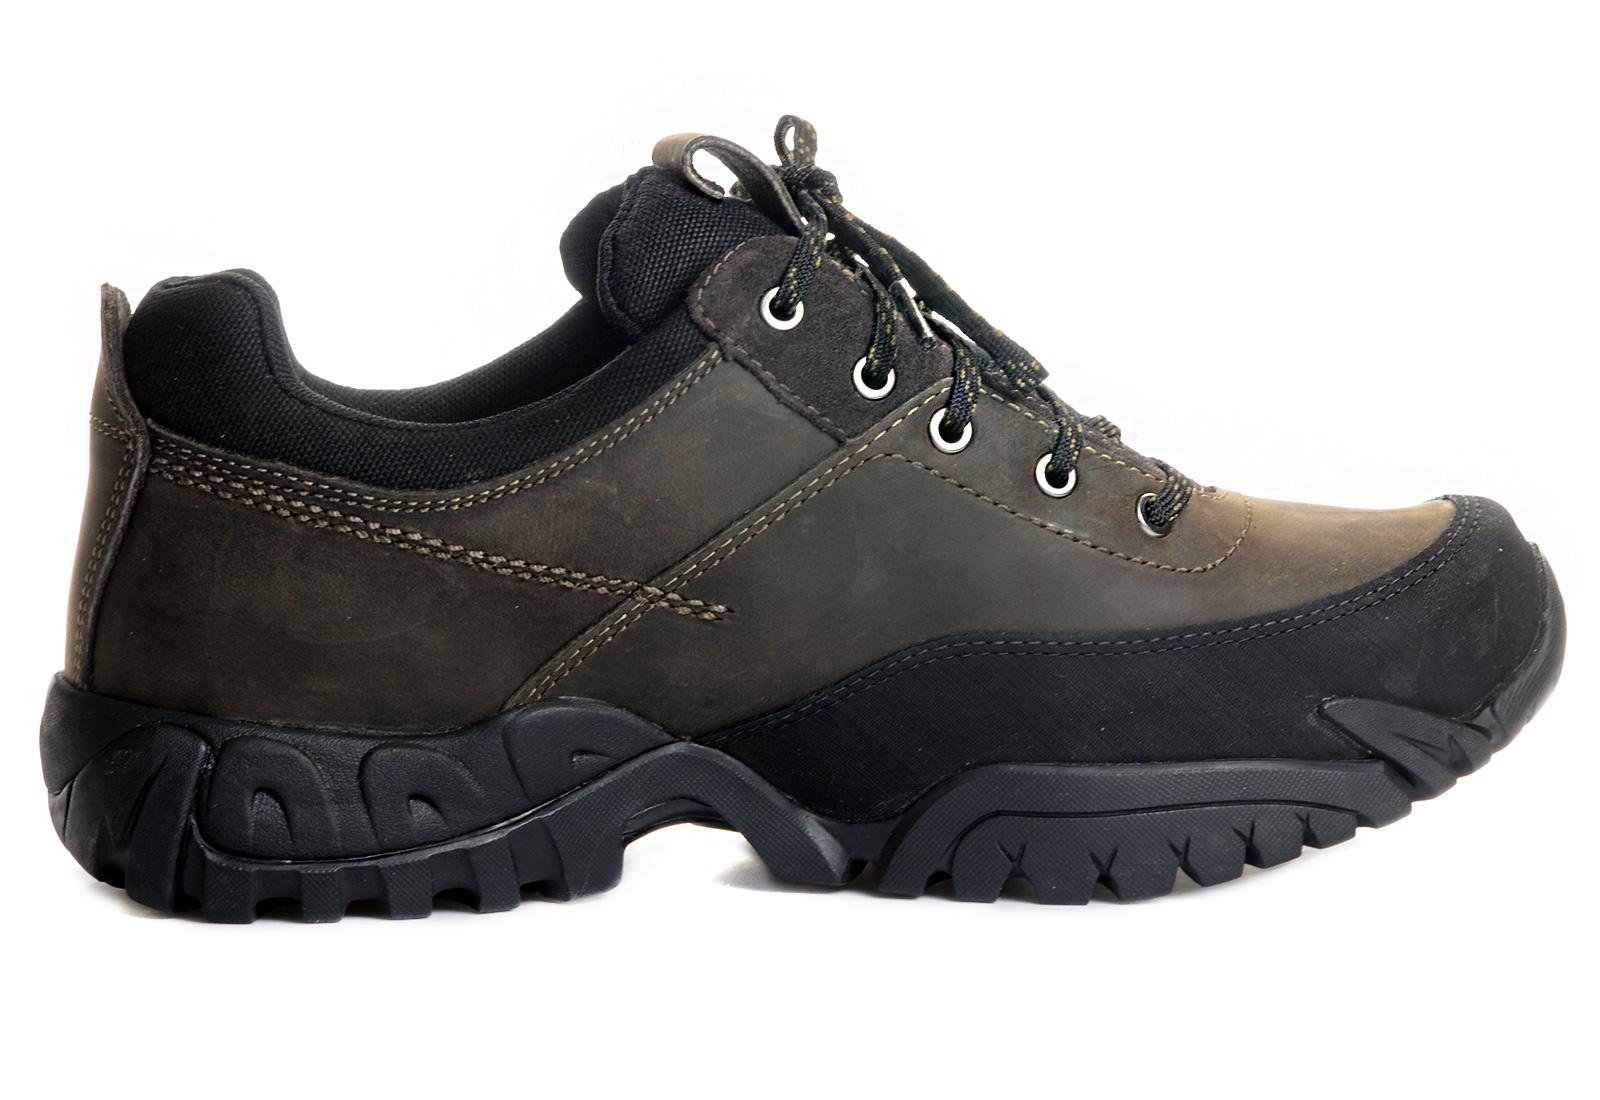 Timberland Boots - Ek Rolston Low Wp - 9360r-dbr